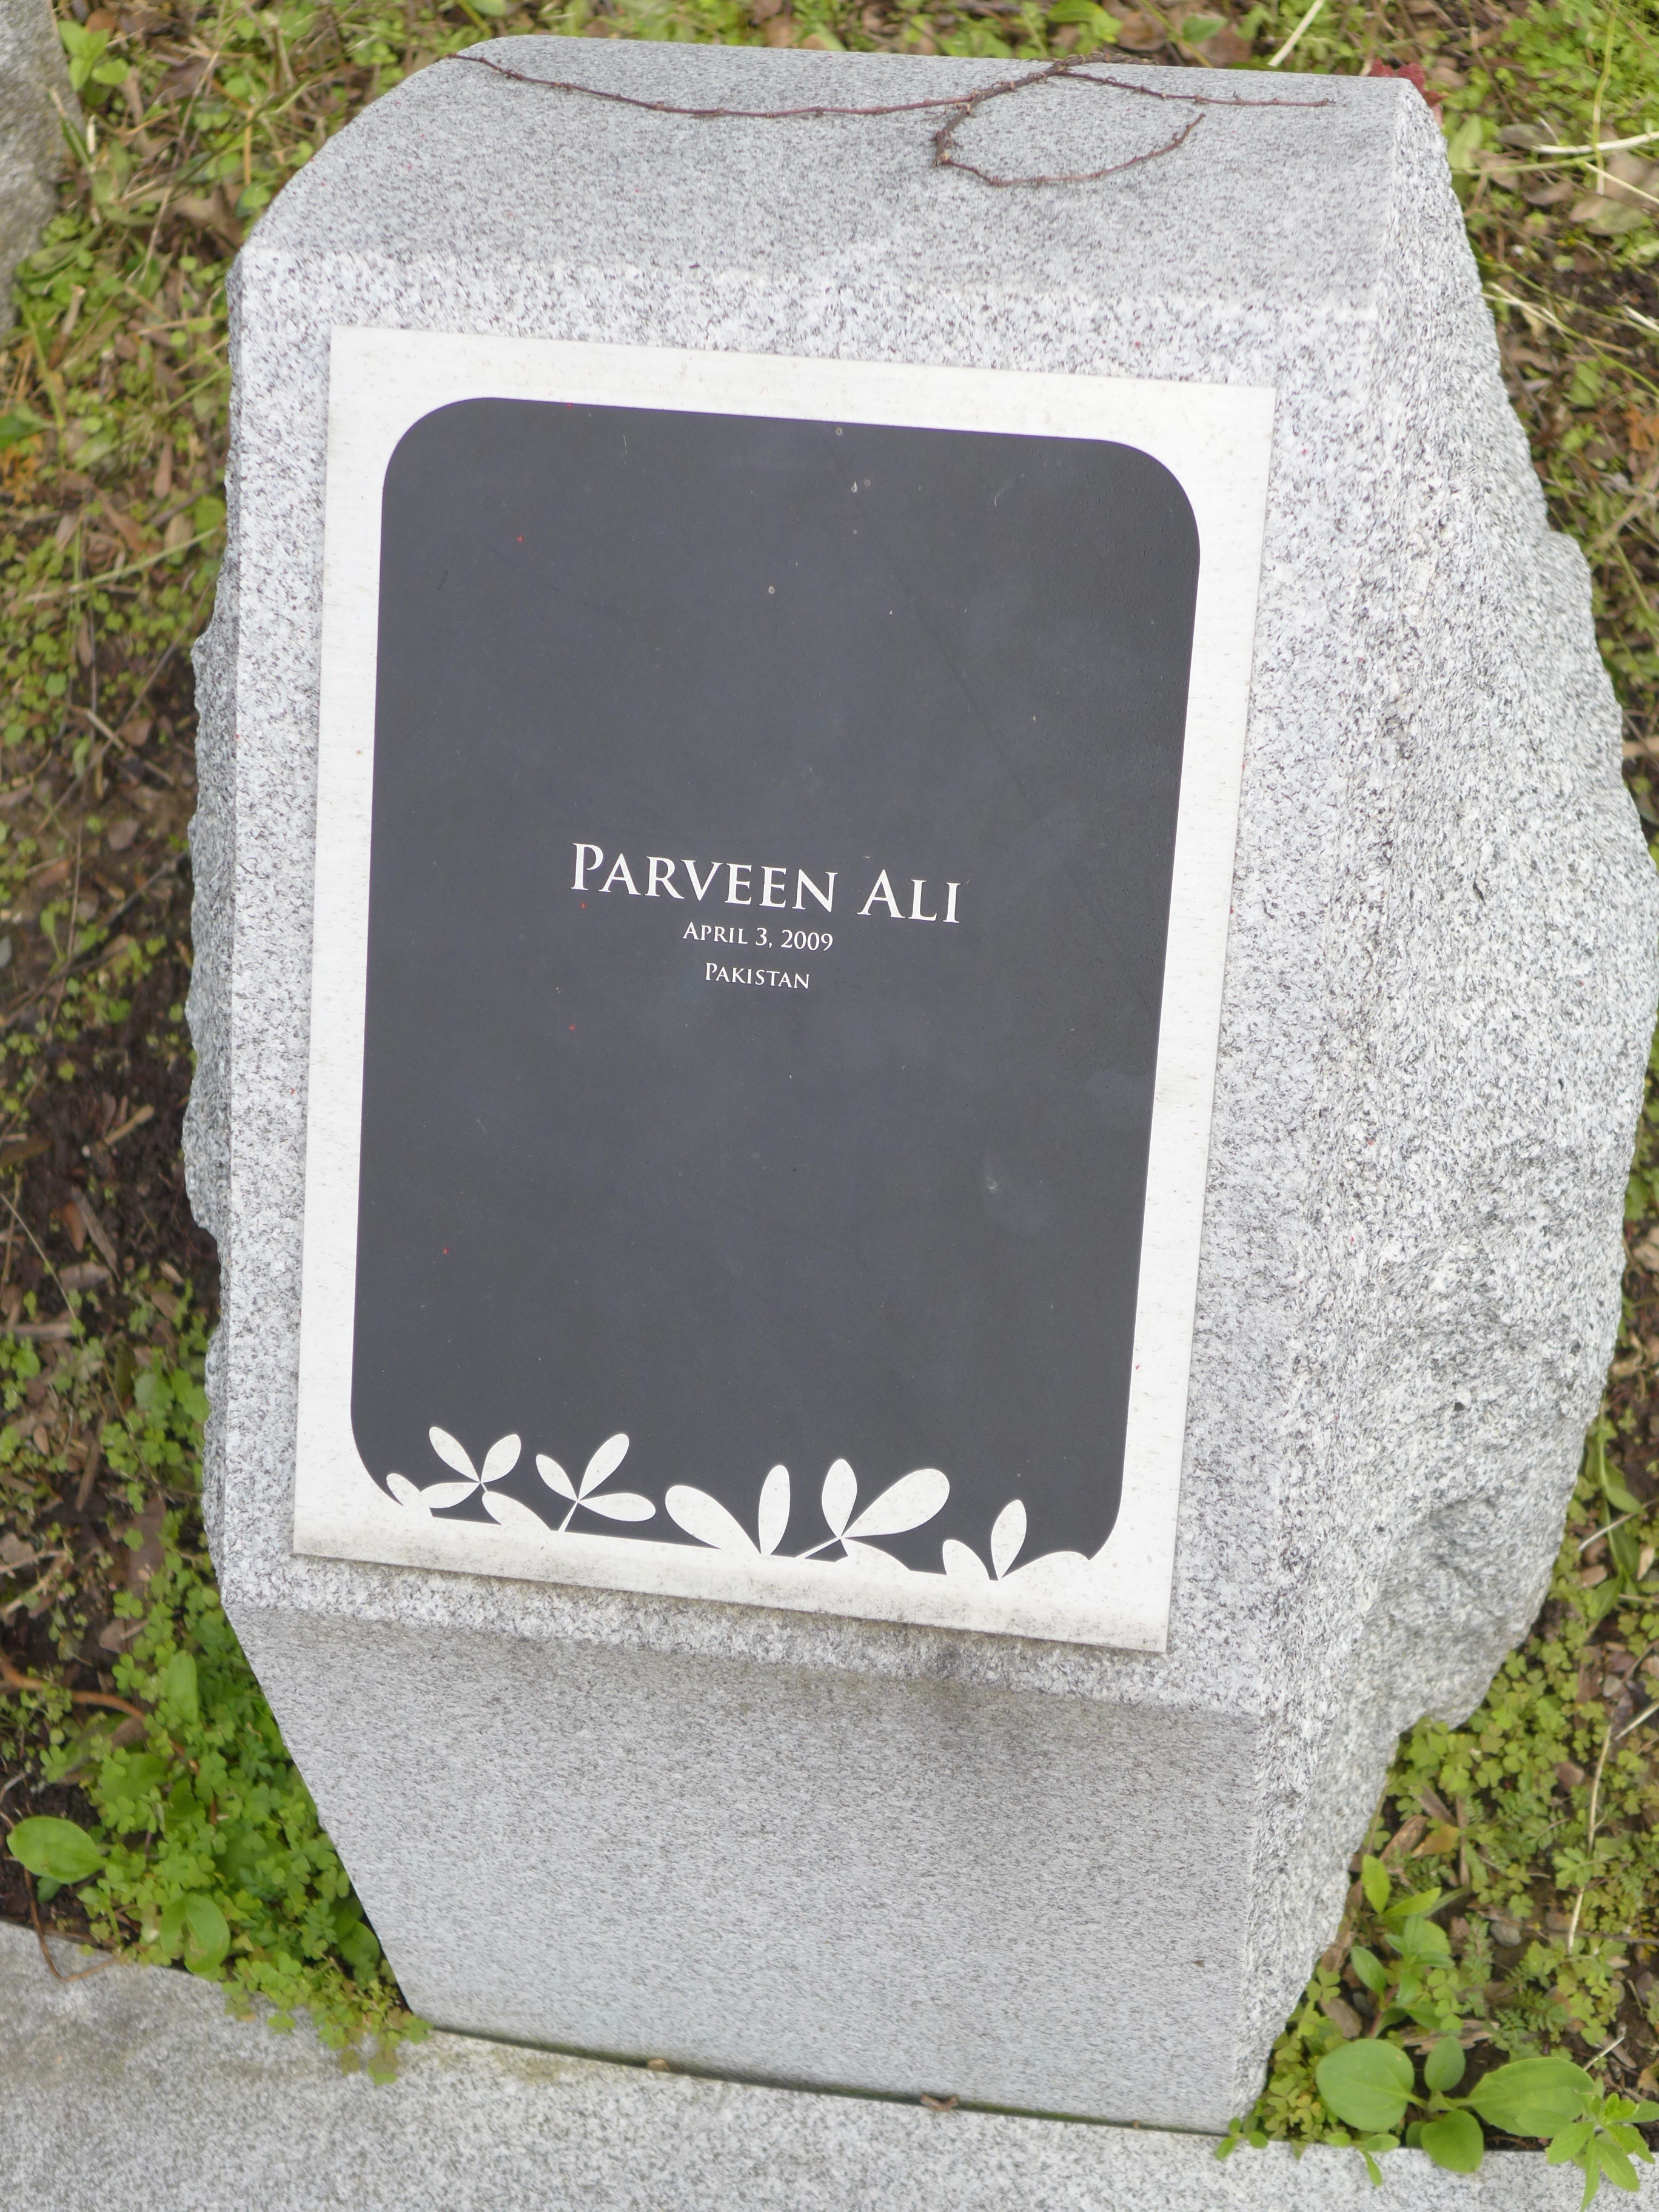 Memorial stone: Parveen Ali / Pakistan